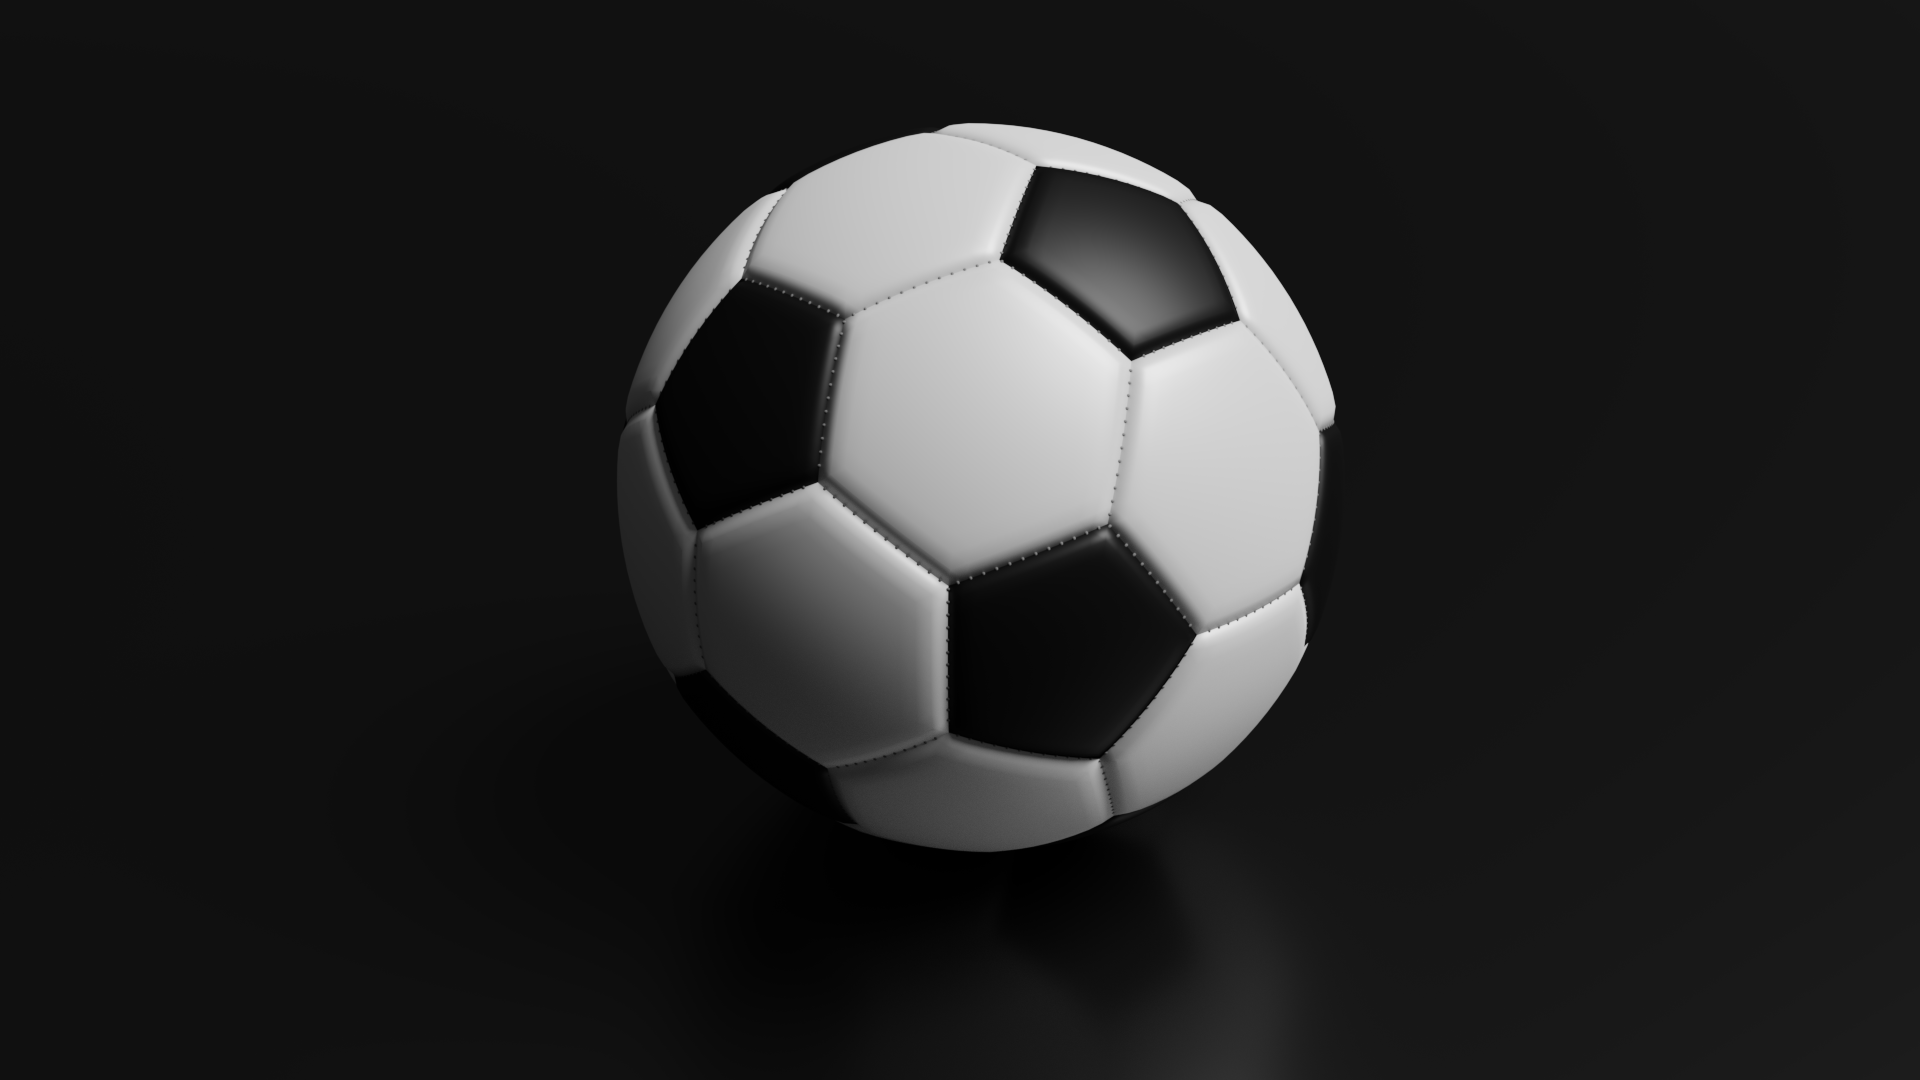 High Detailed Football Ball Detailed High Ball